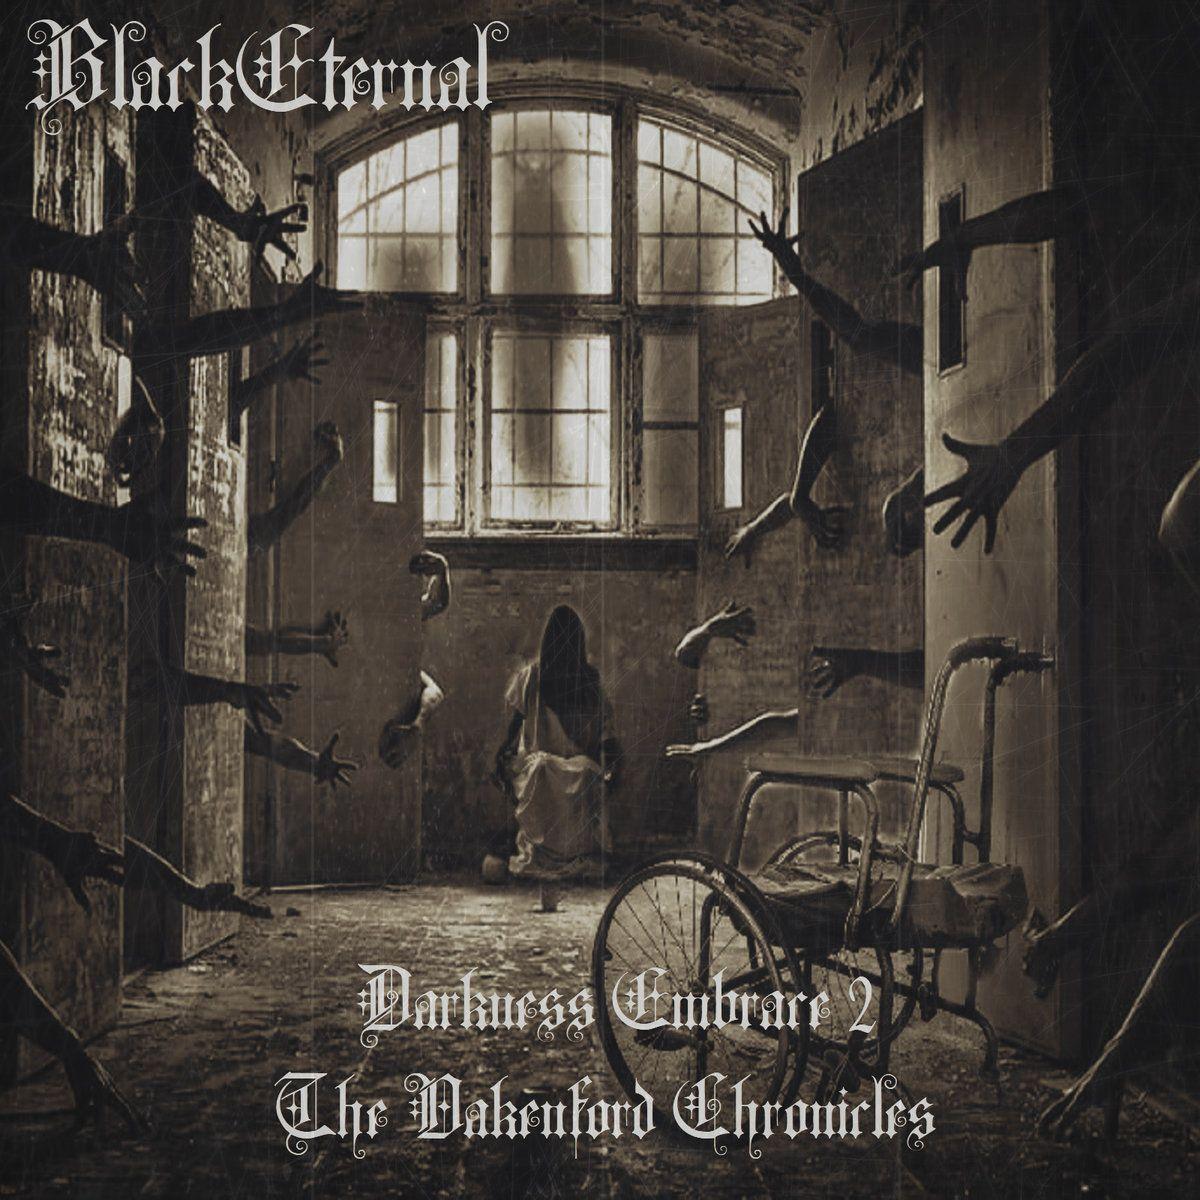 Black Eternal - Darkness Embrace II: The Oakenford Chronicles